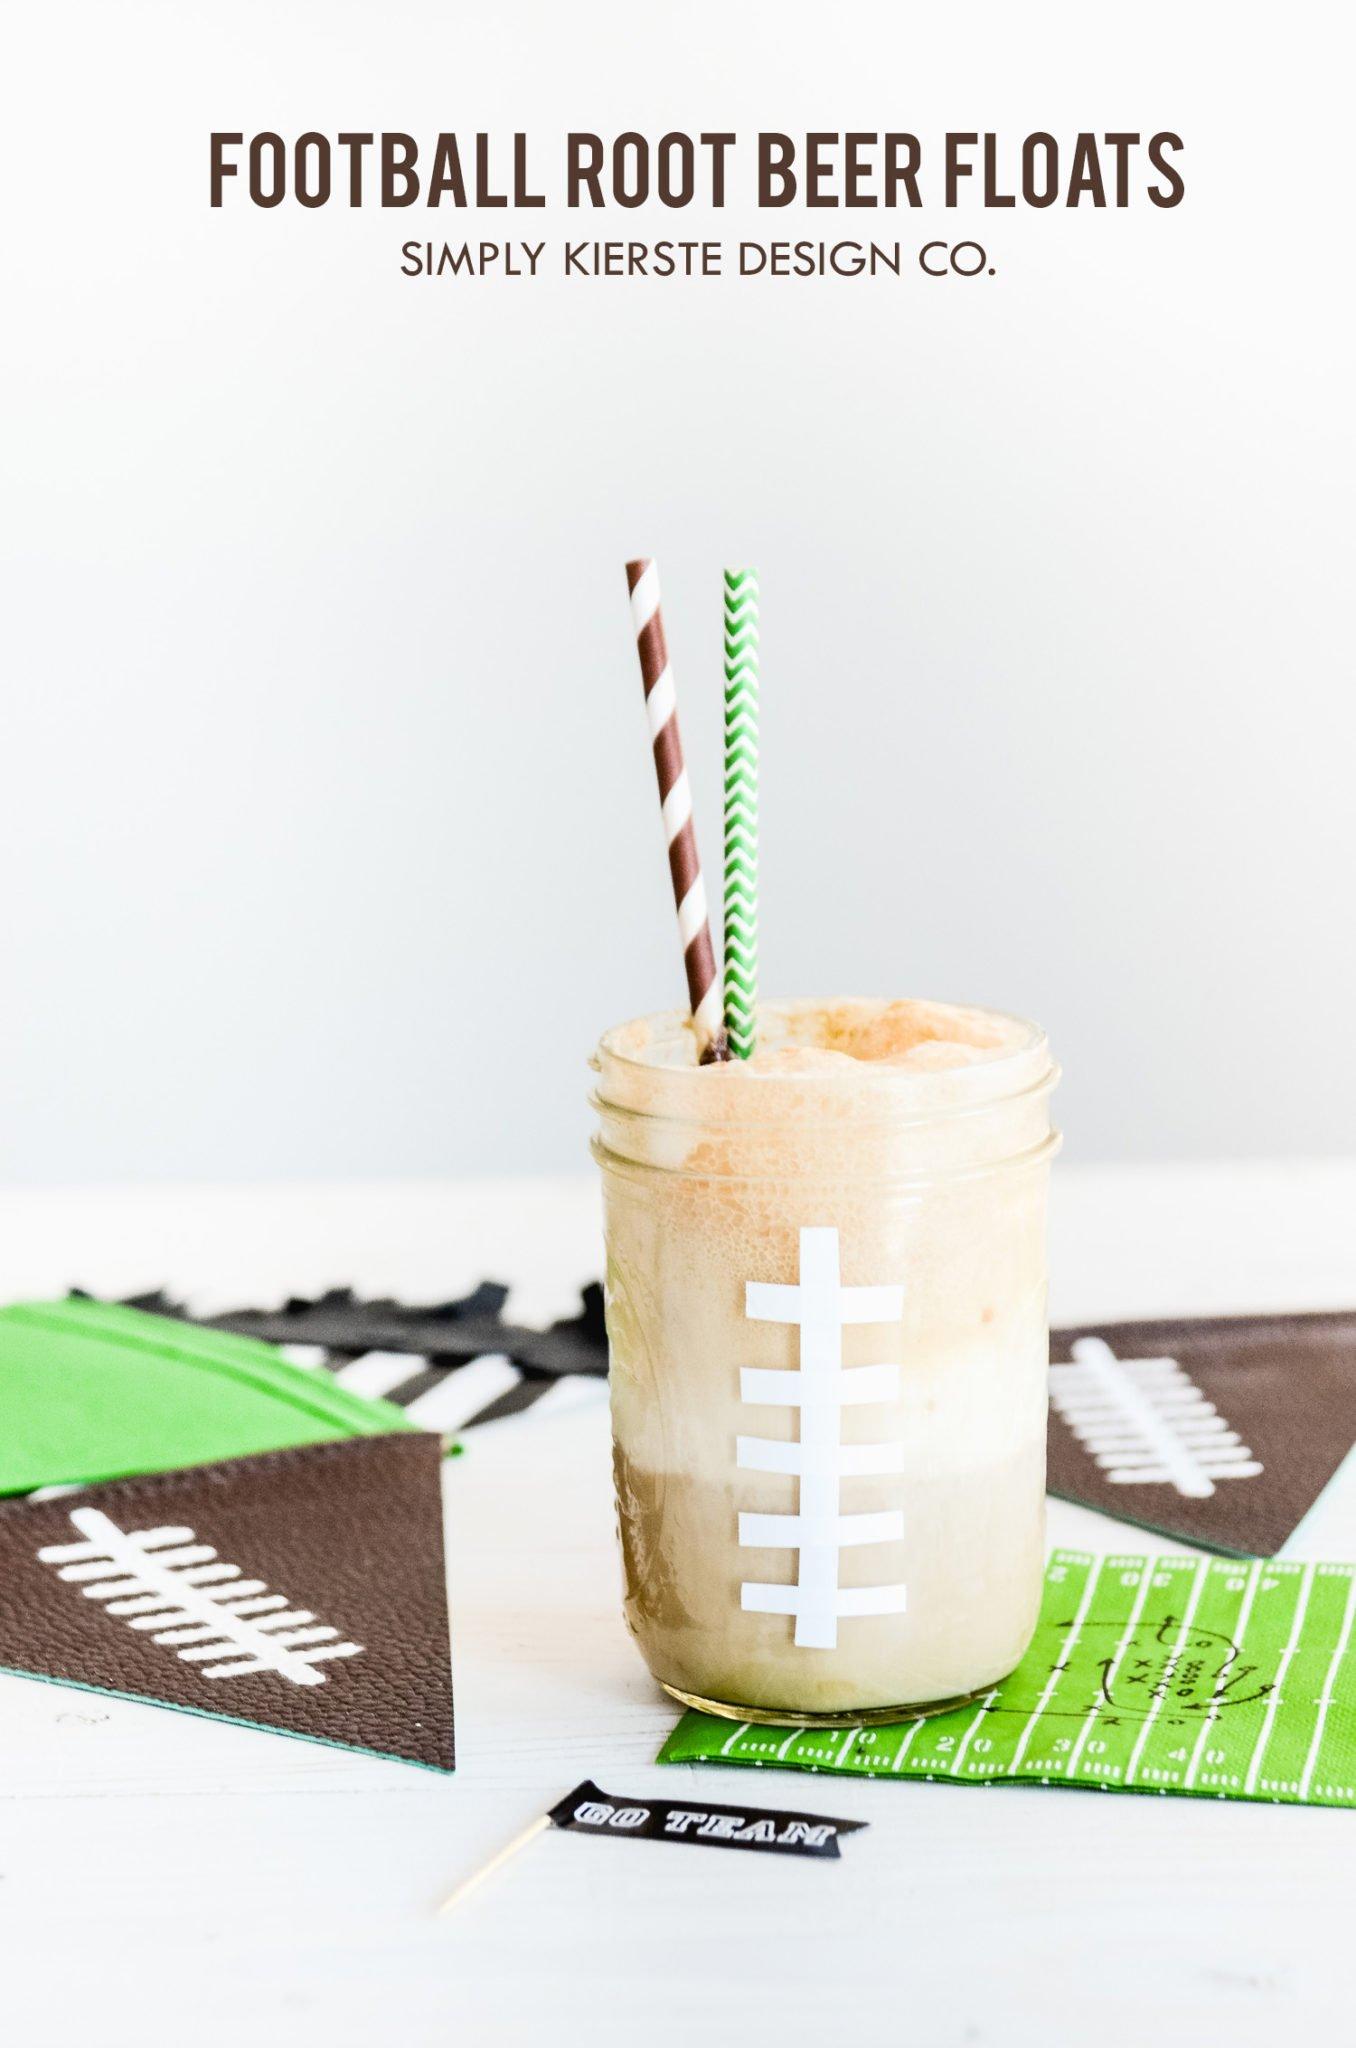 Football Root Beer Floats   Game Day Treats   simplykierste.com #footballtreats #gamedayfood #masonjarideas #gamedayrecipes